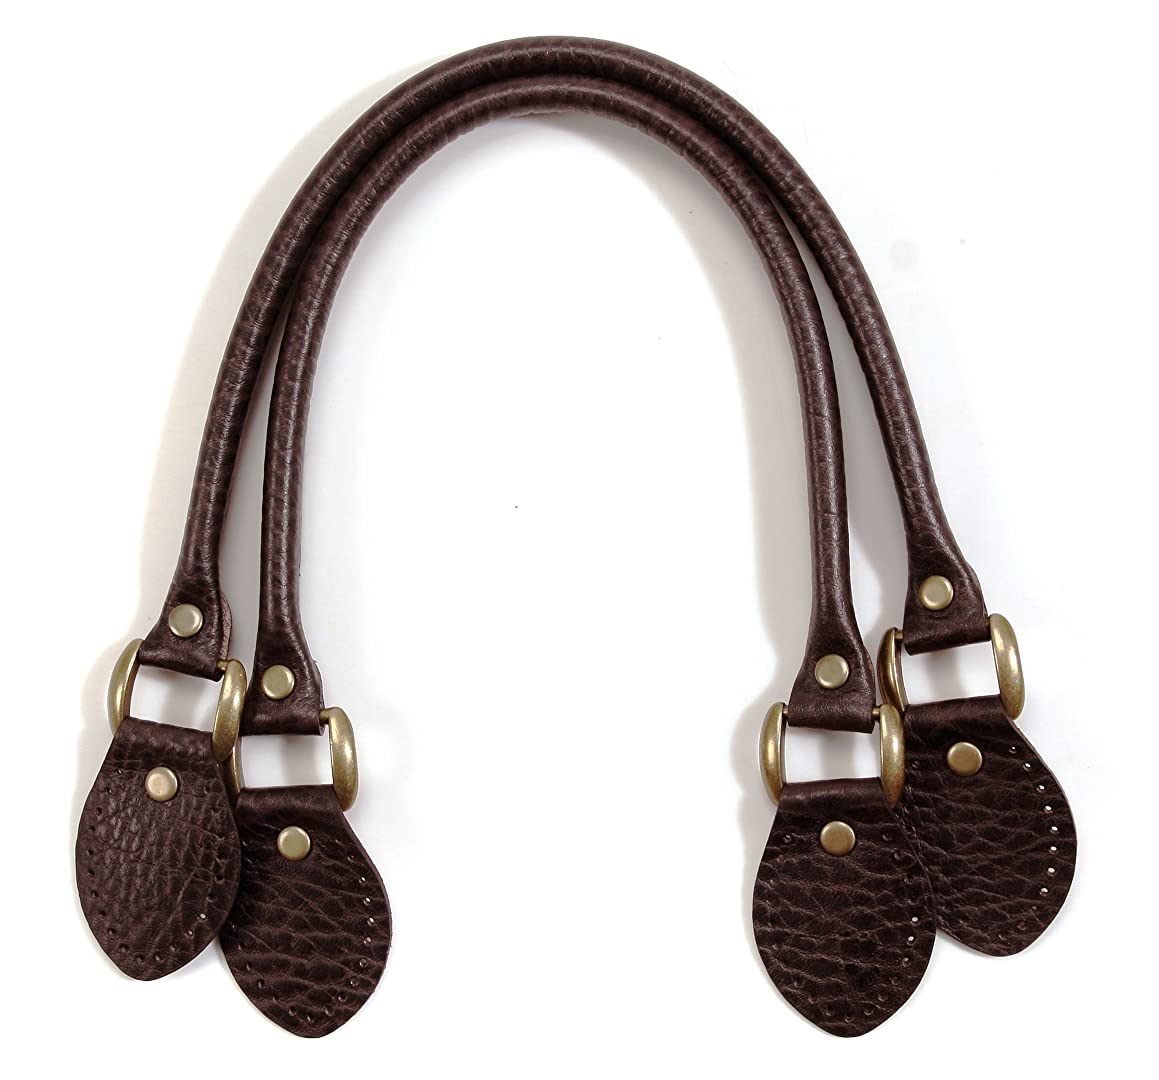 byhands Embossed Genuine Leather Purse Handles / Bag Strap, Brown, 18.9